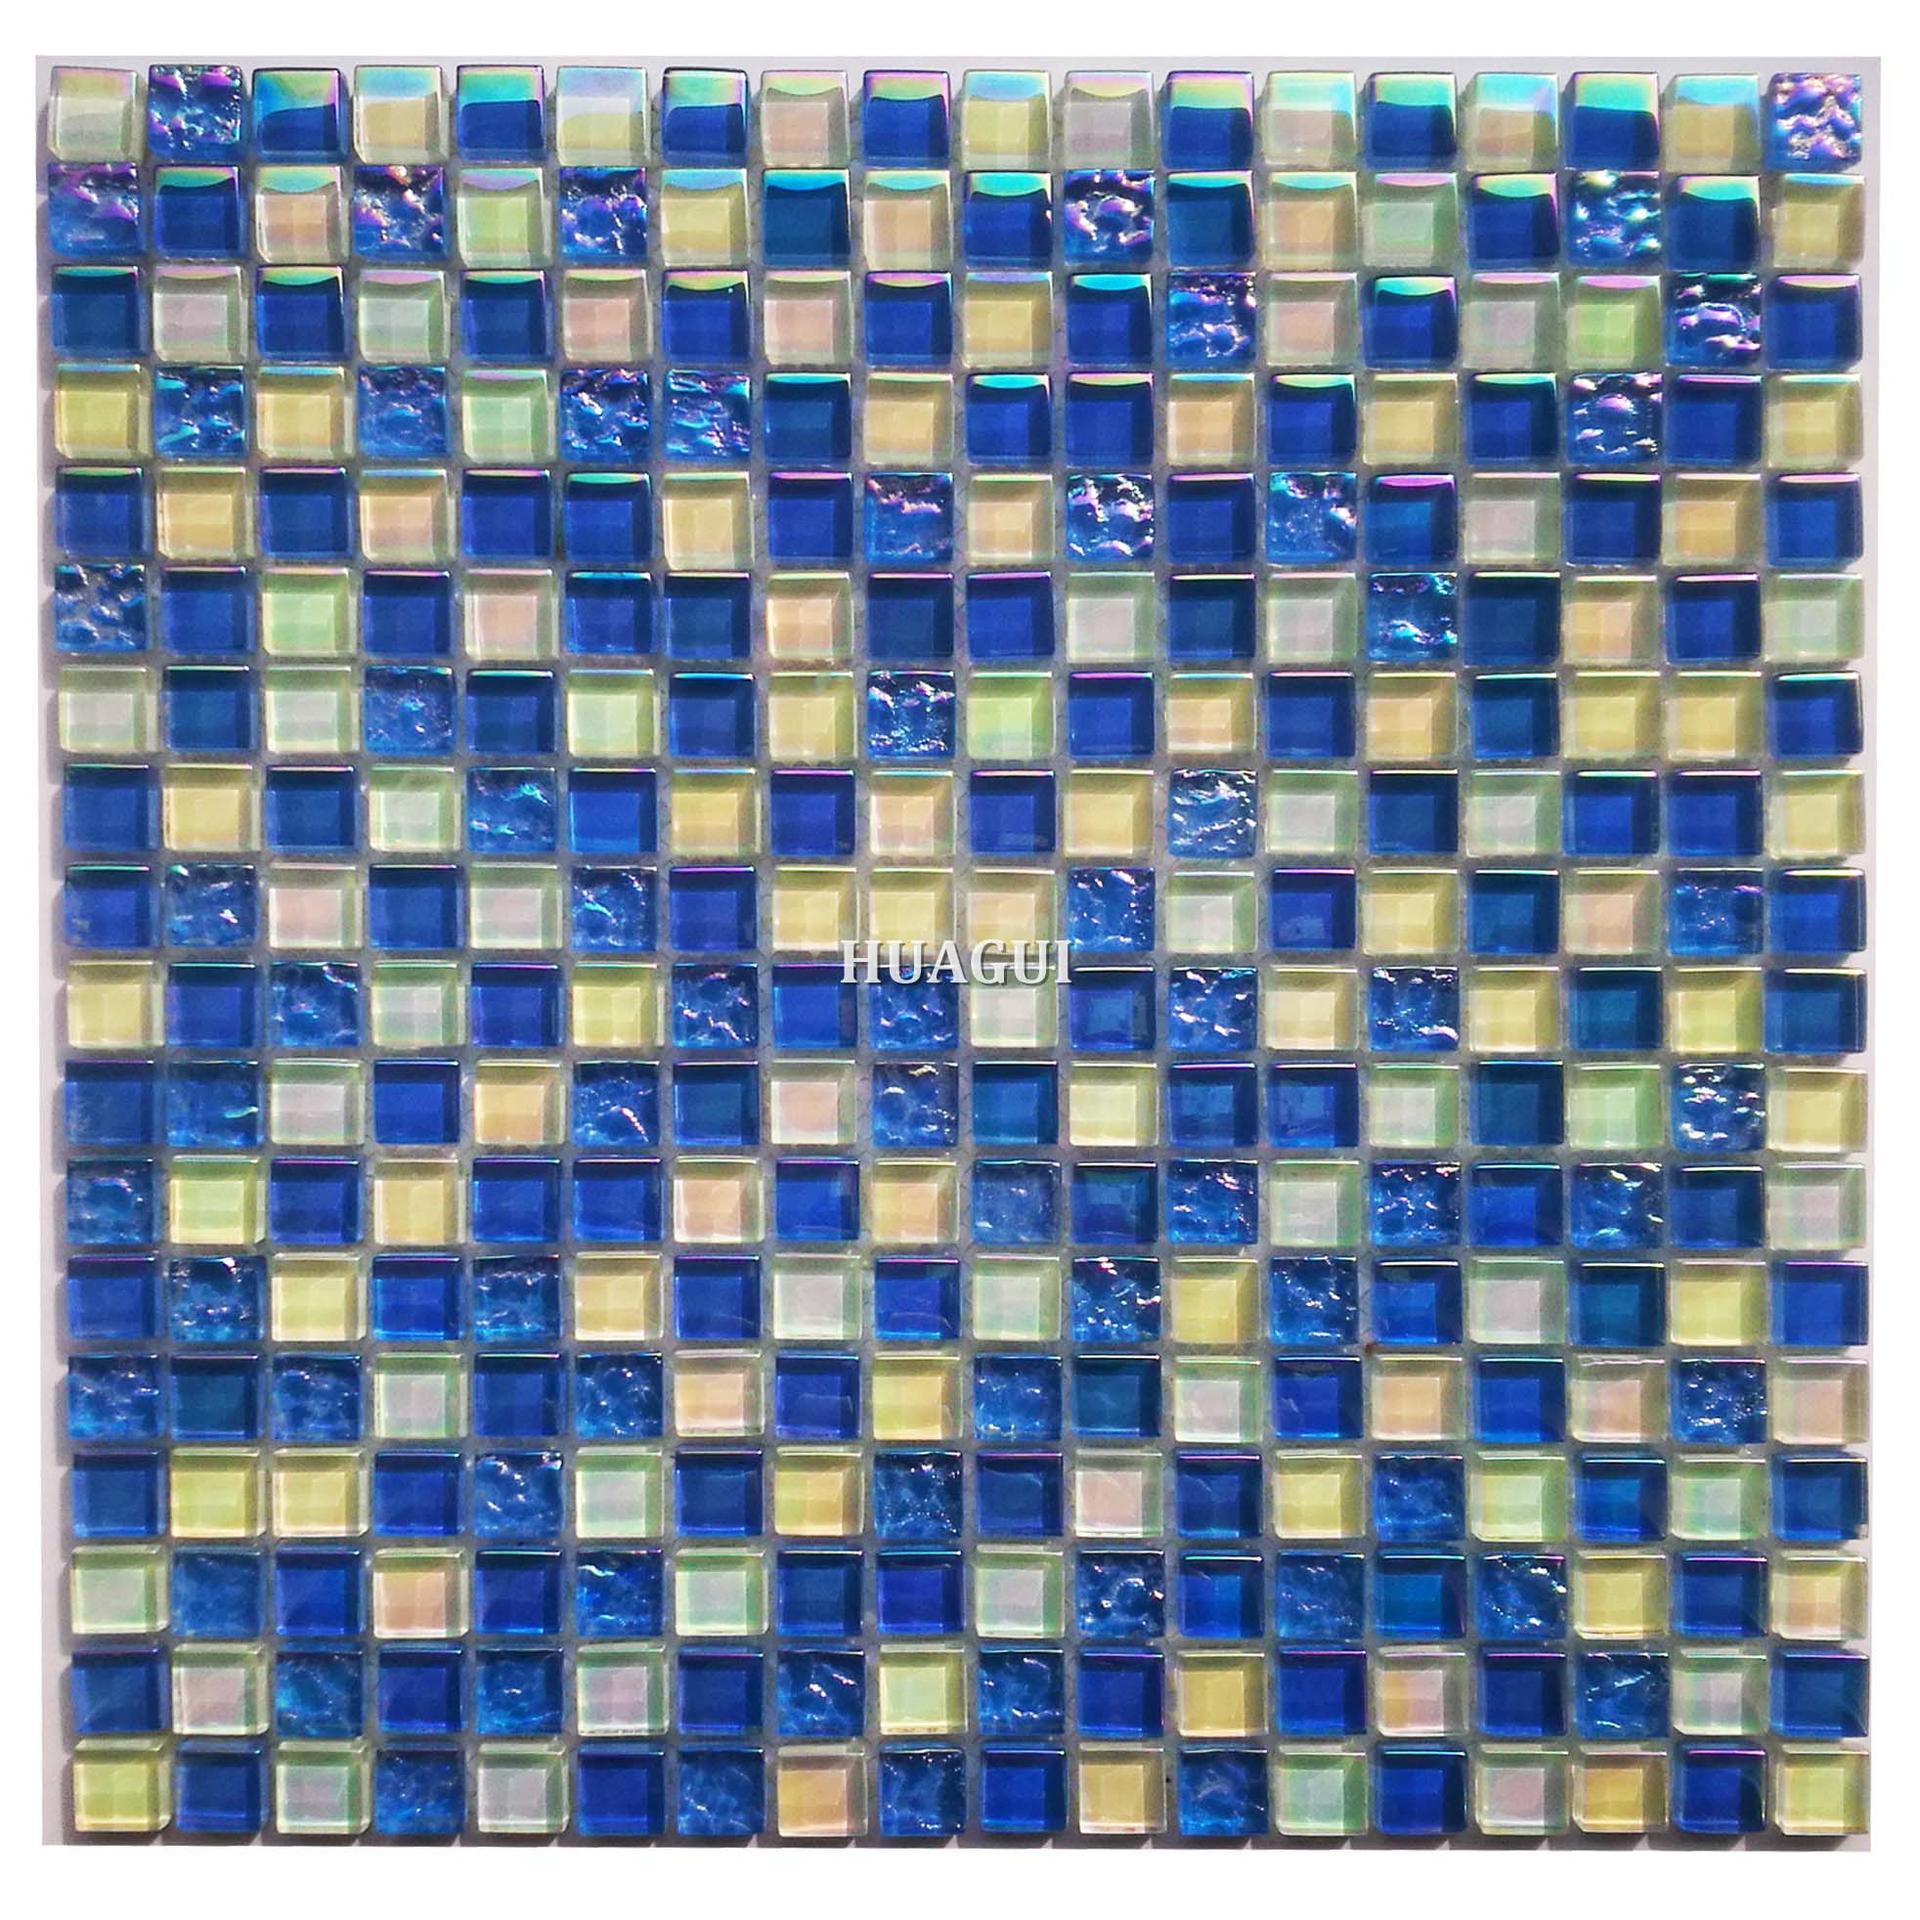 15x15 Blue square glass mosaic tile rainbow tile for bathroom